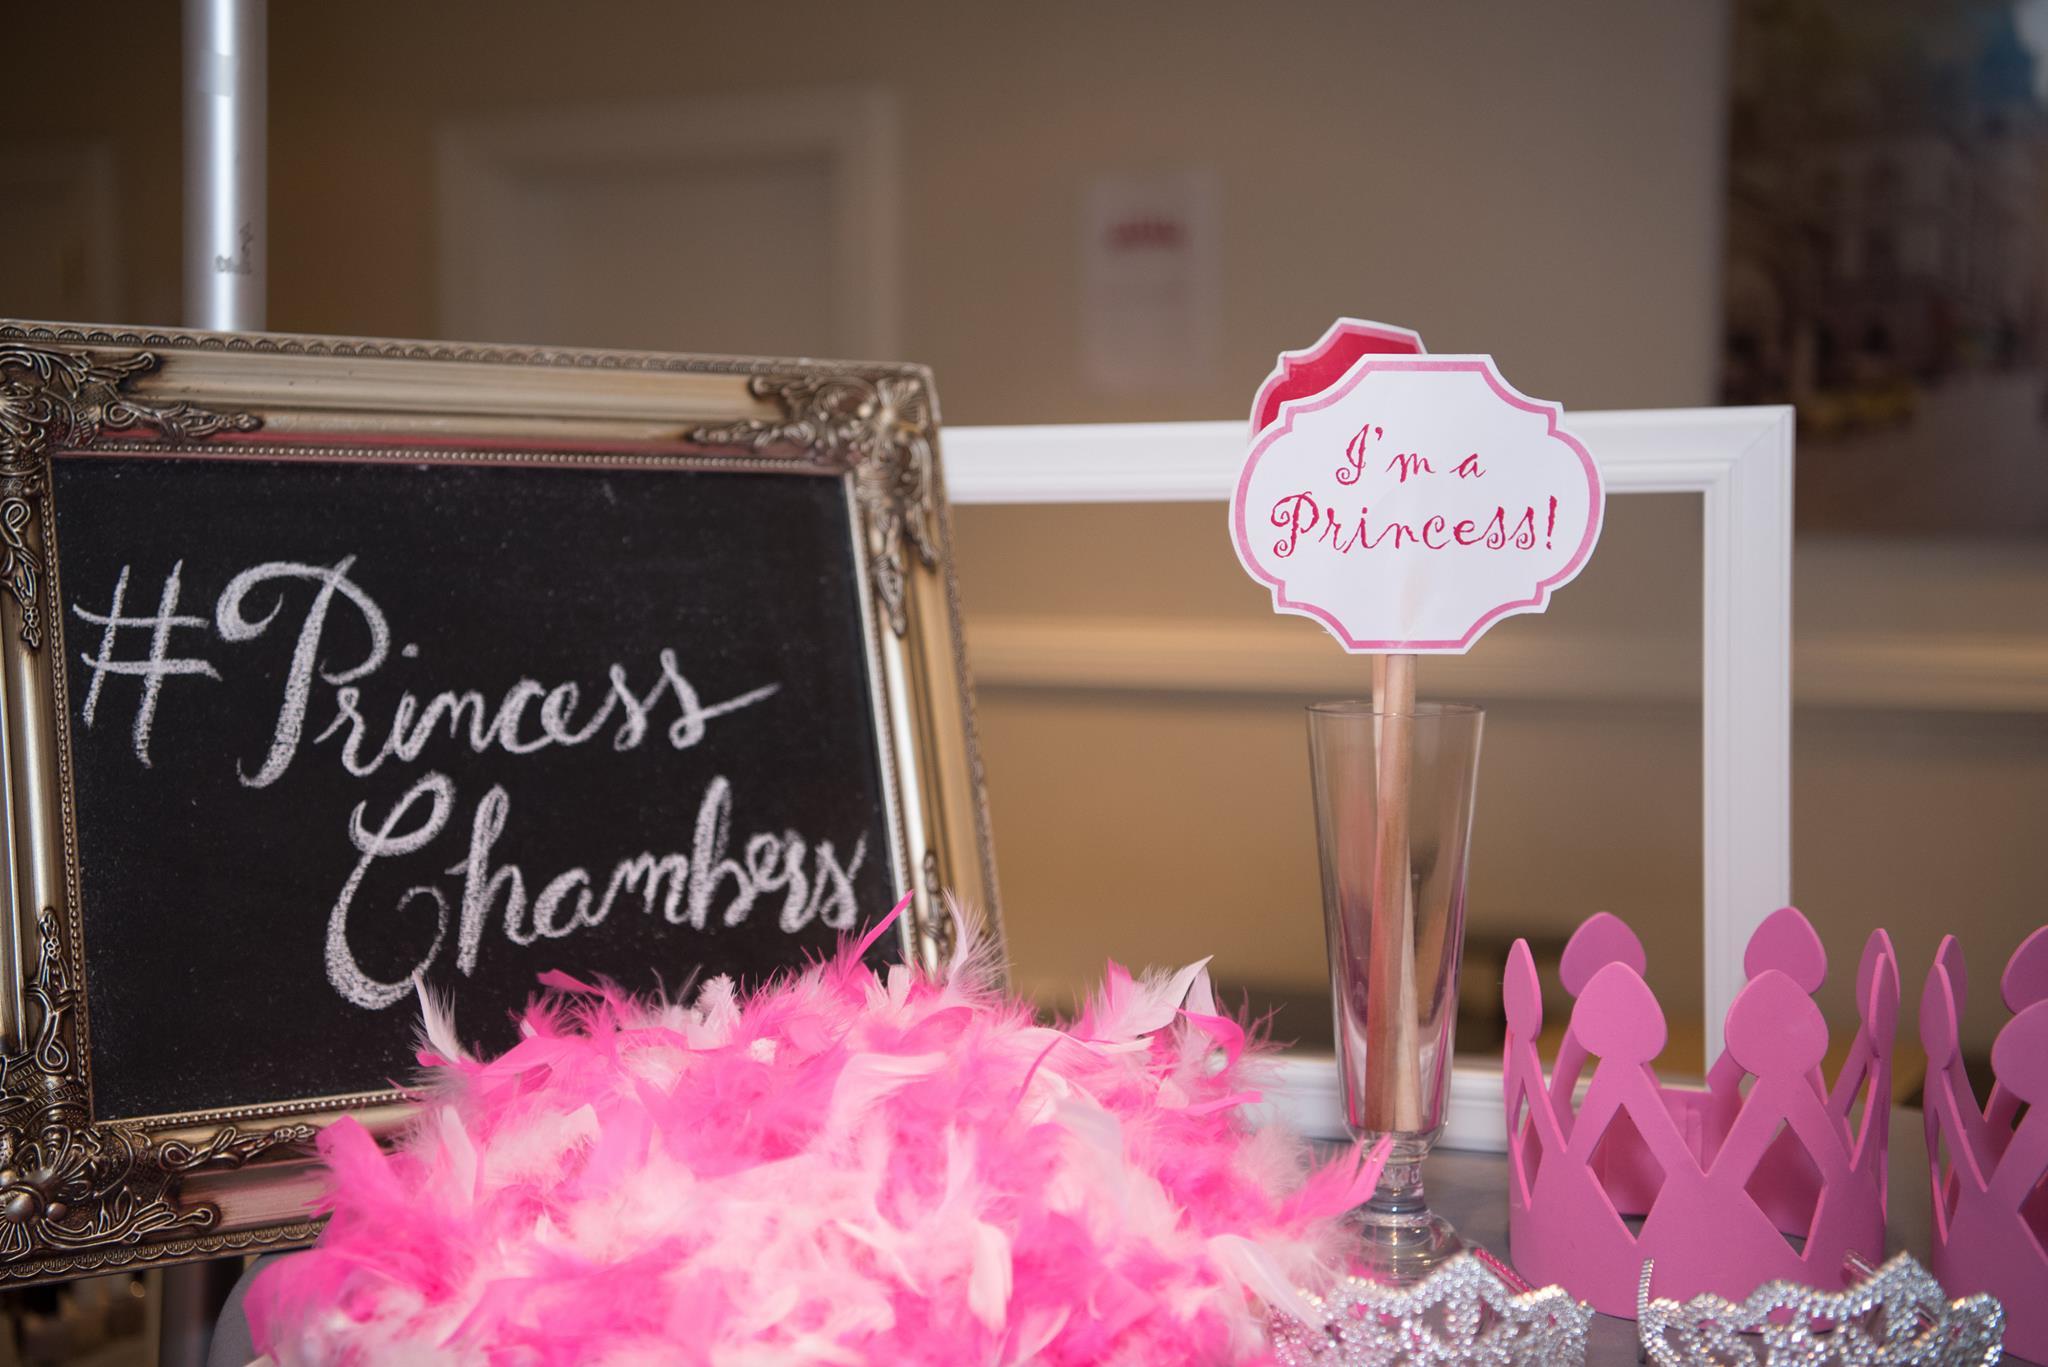 PRINCESS-CHAMBERS-PROM-GIVEAWAY